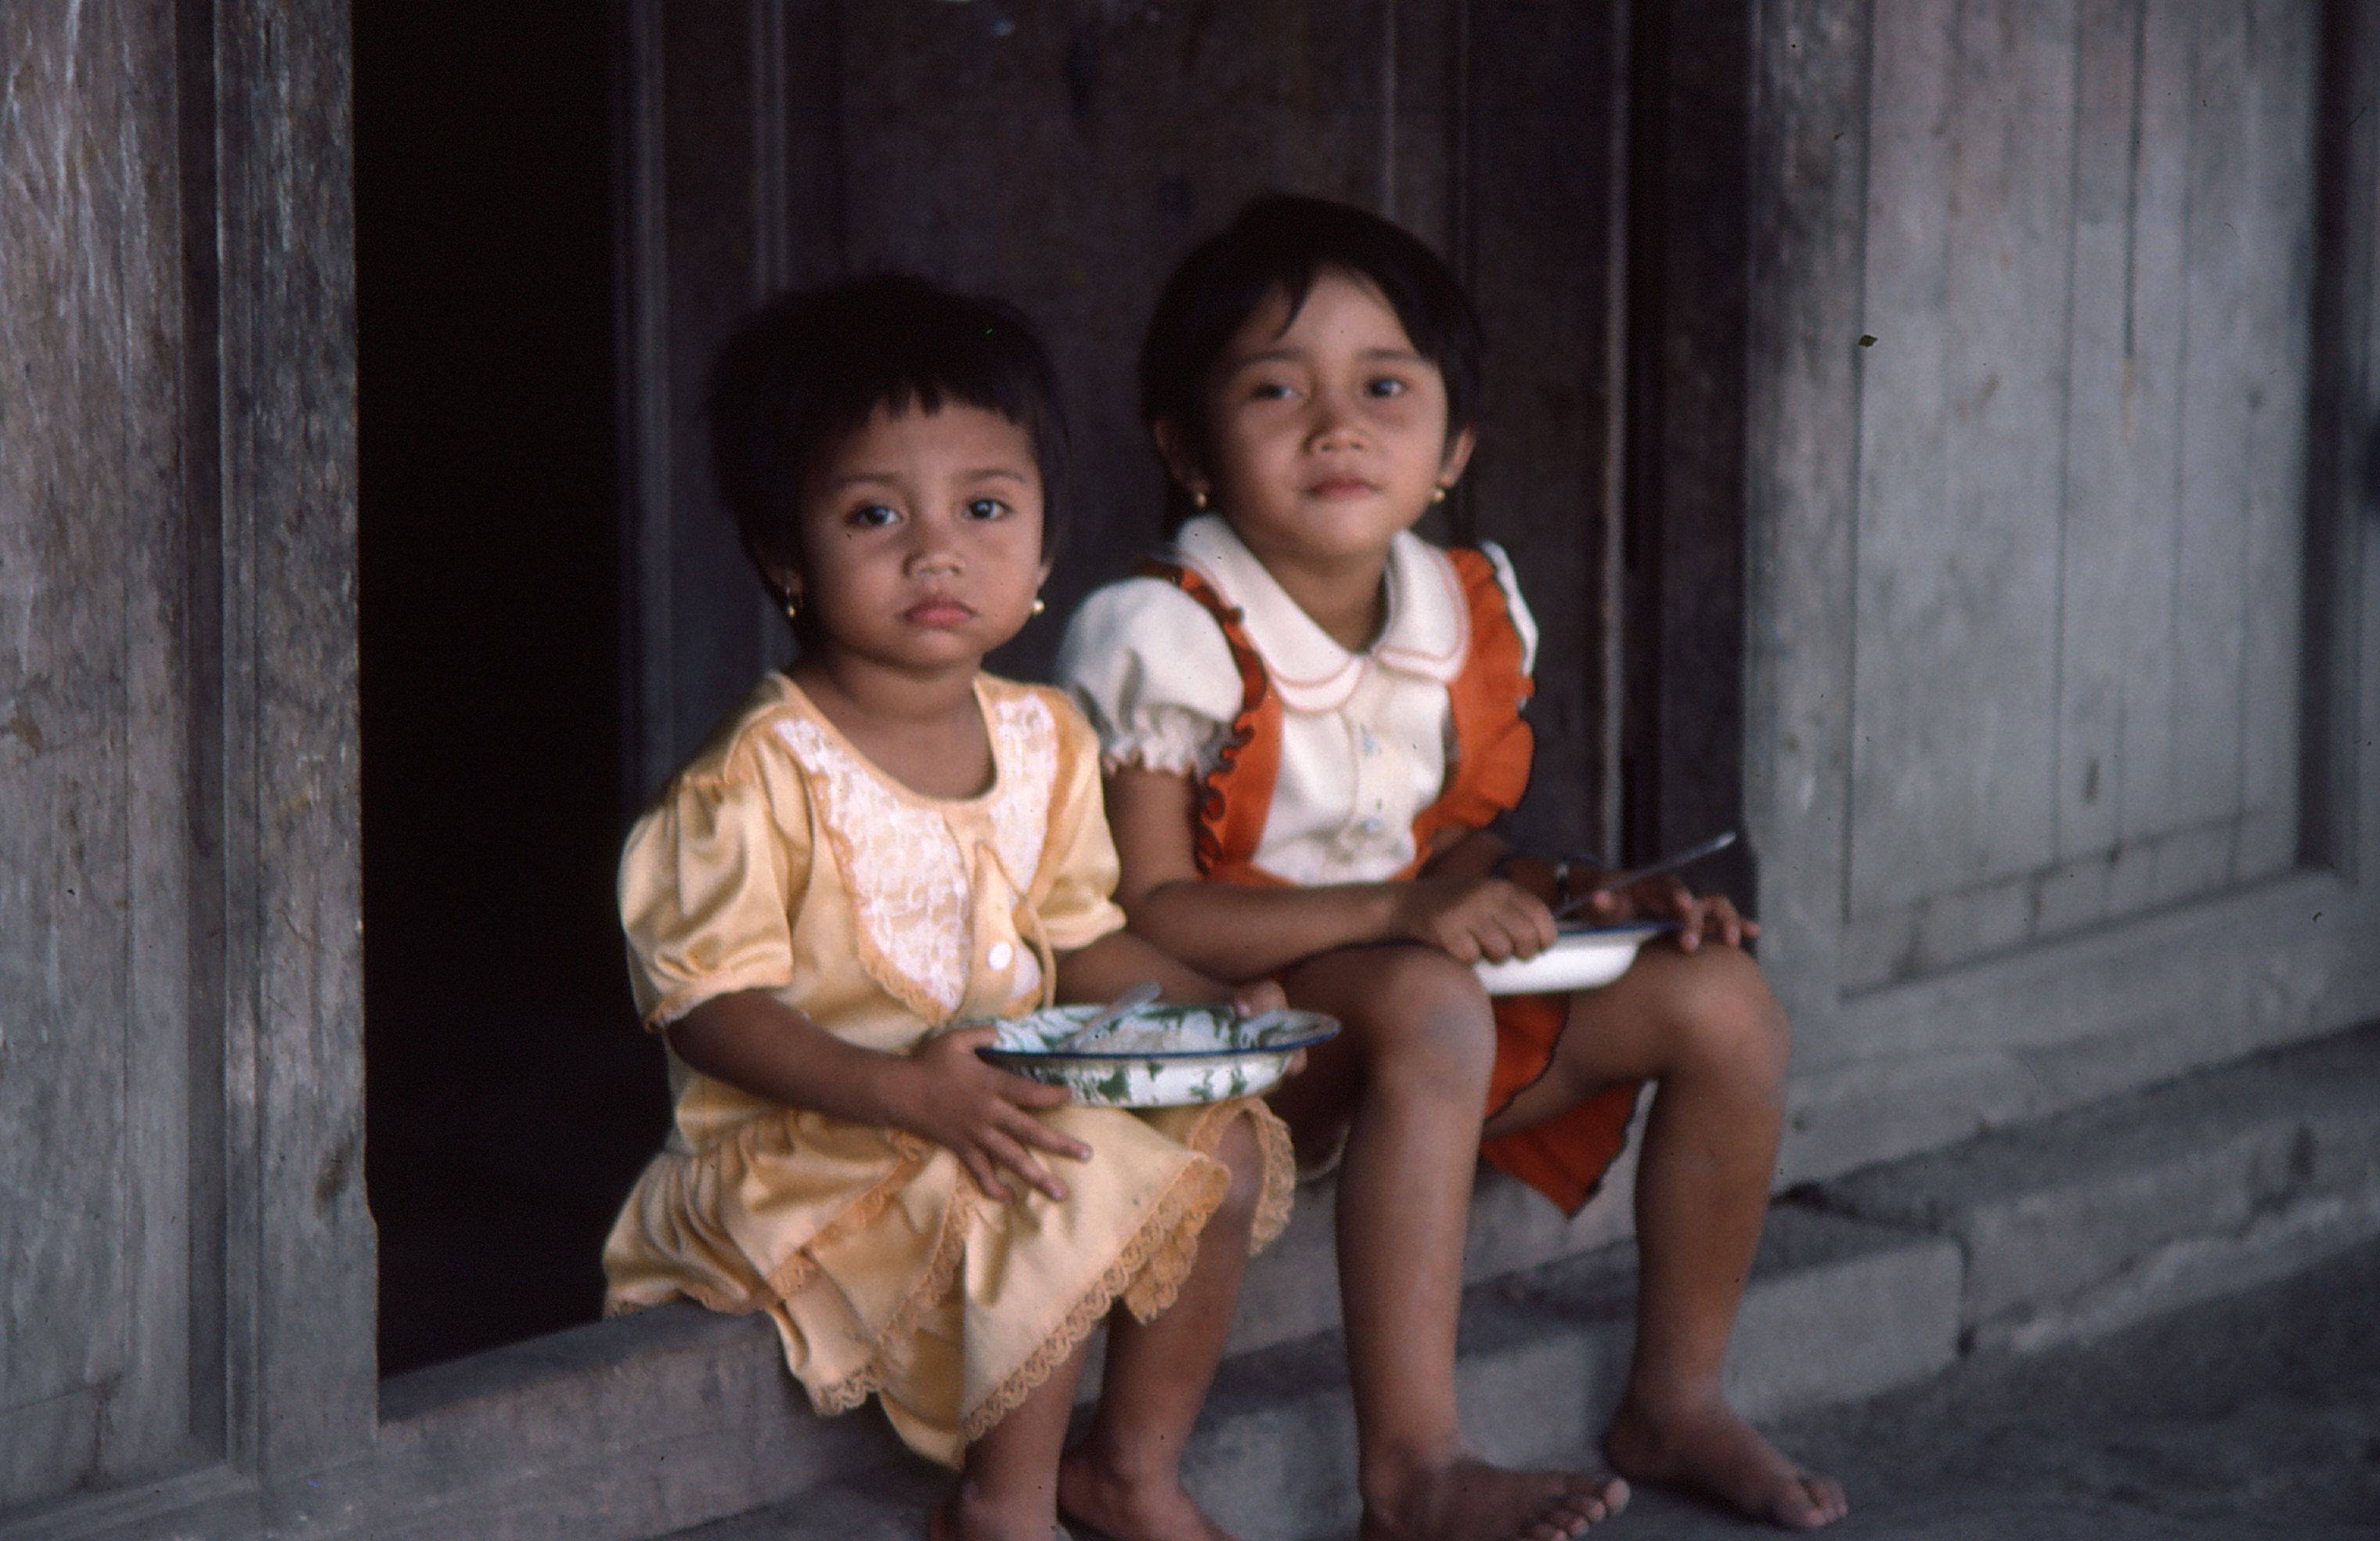 deux enfants sages